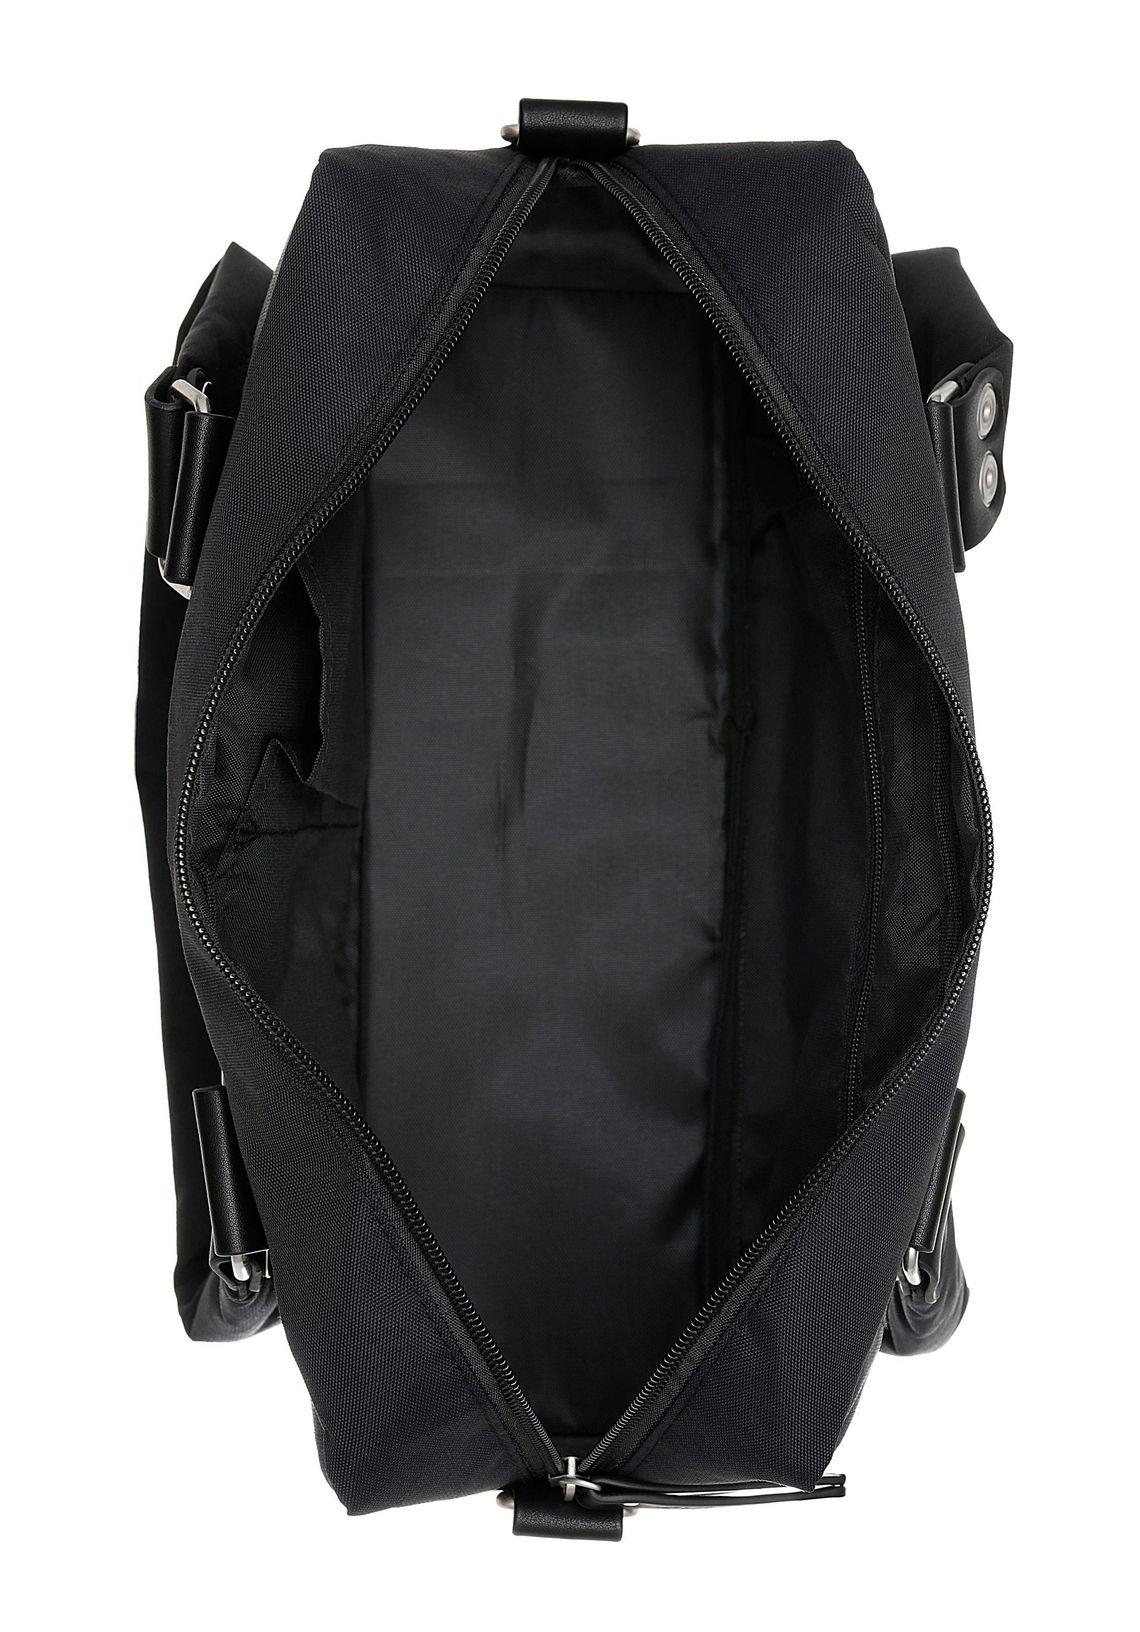 Chiemsee tas snel online gekocht  zwart